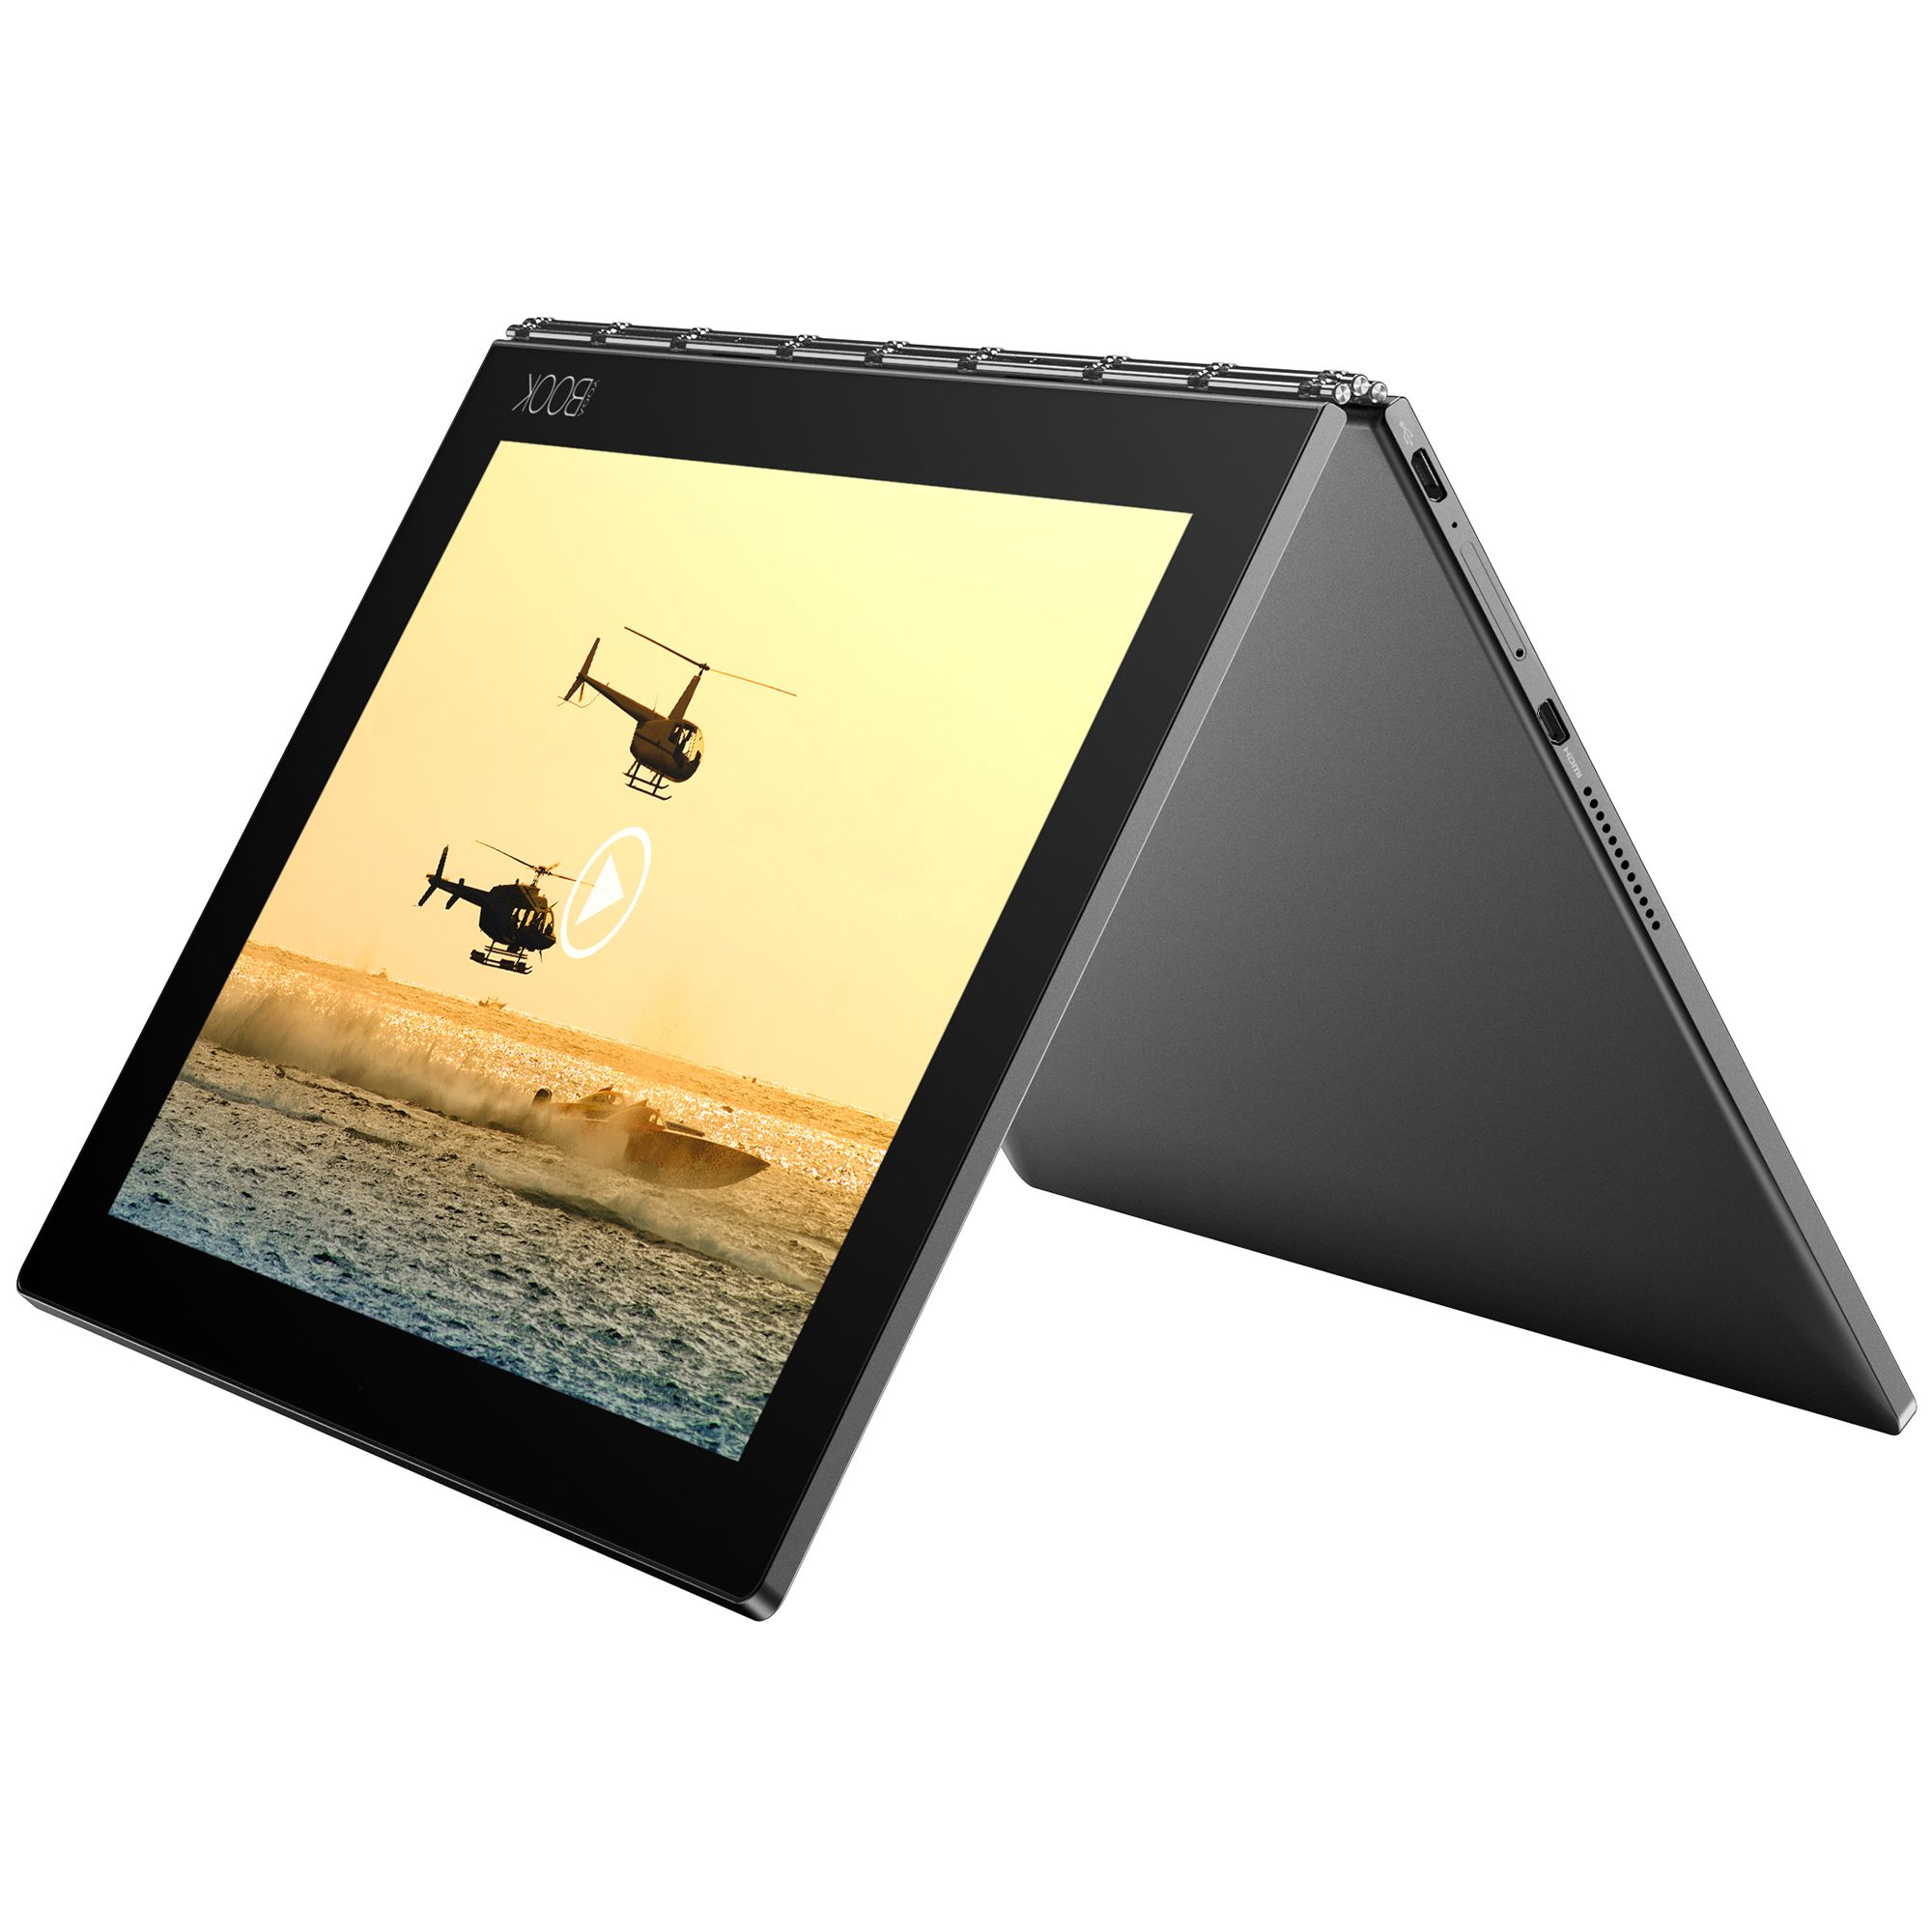 Tableta Lenovo Yoga Book 10.1 Intel Atom x5-Z8550 64GB Flash 4GB RAM 4G Windows 10 Pro Black